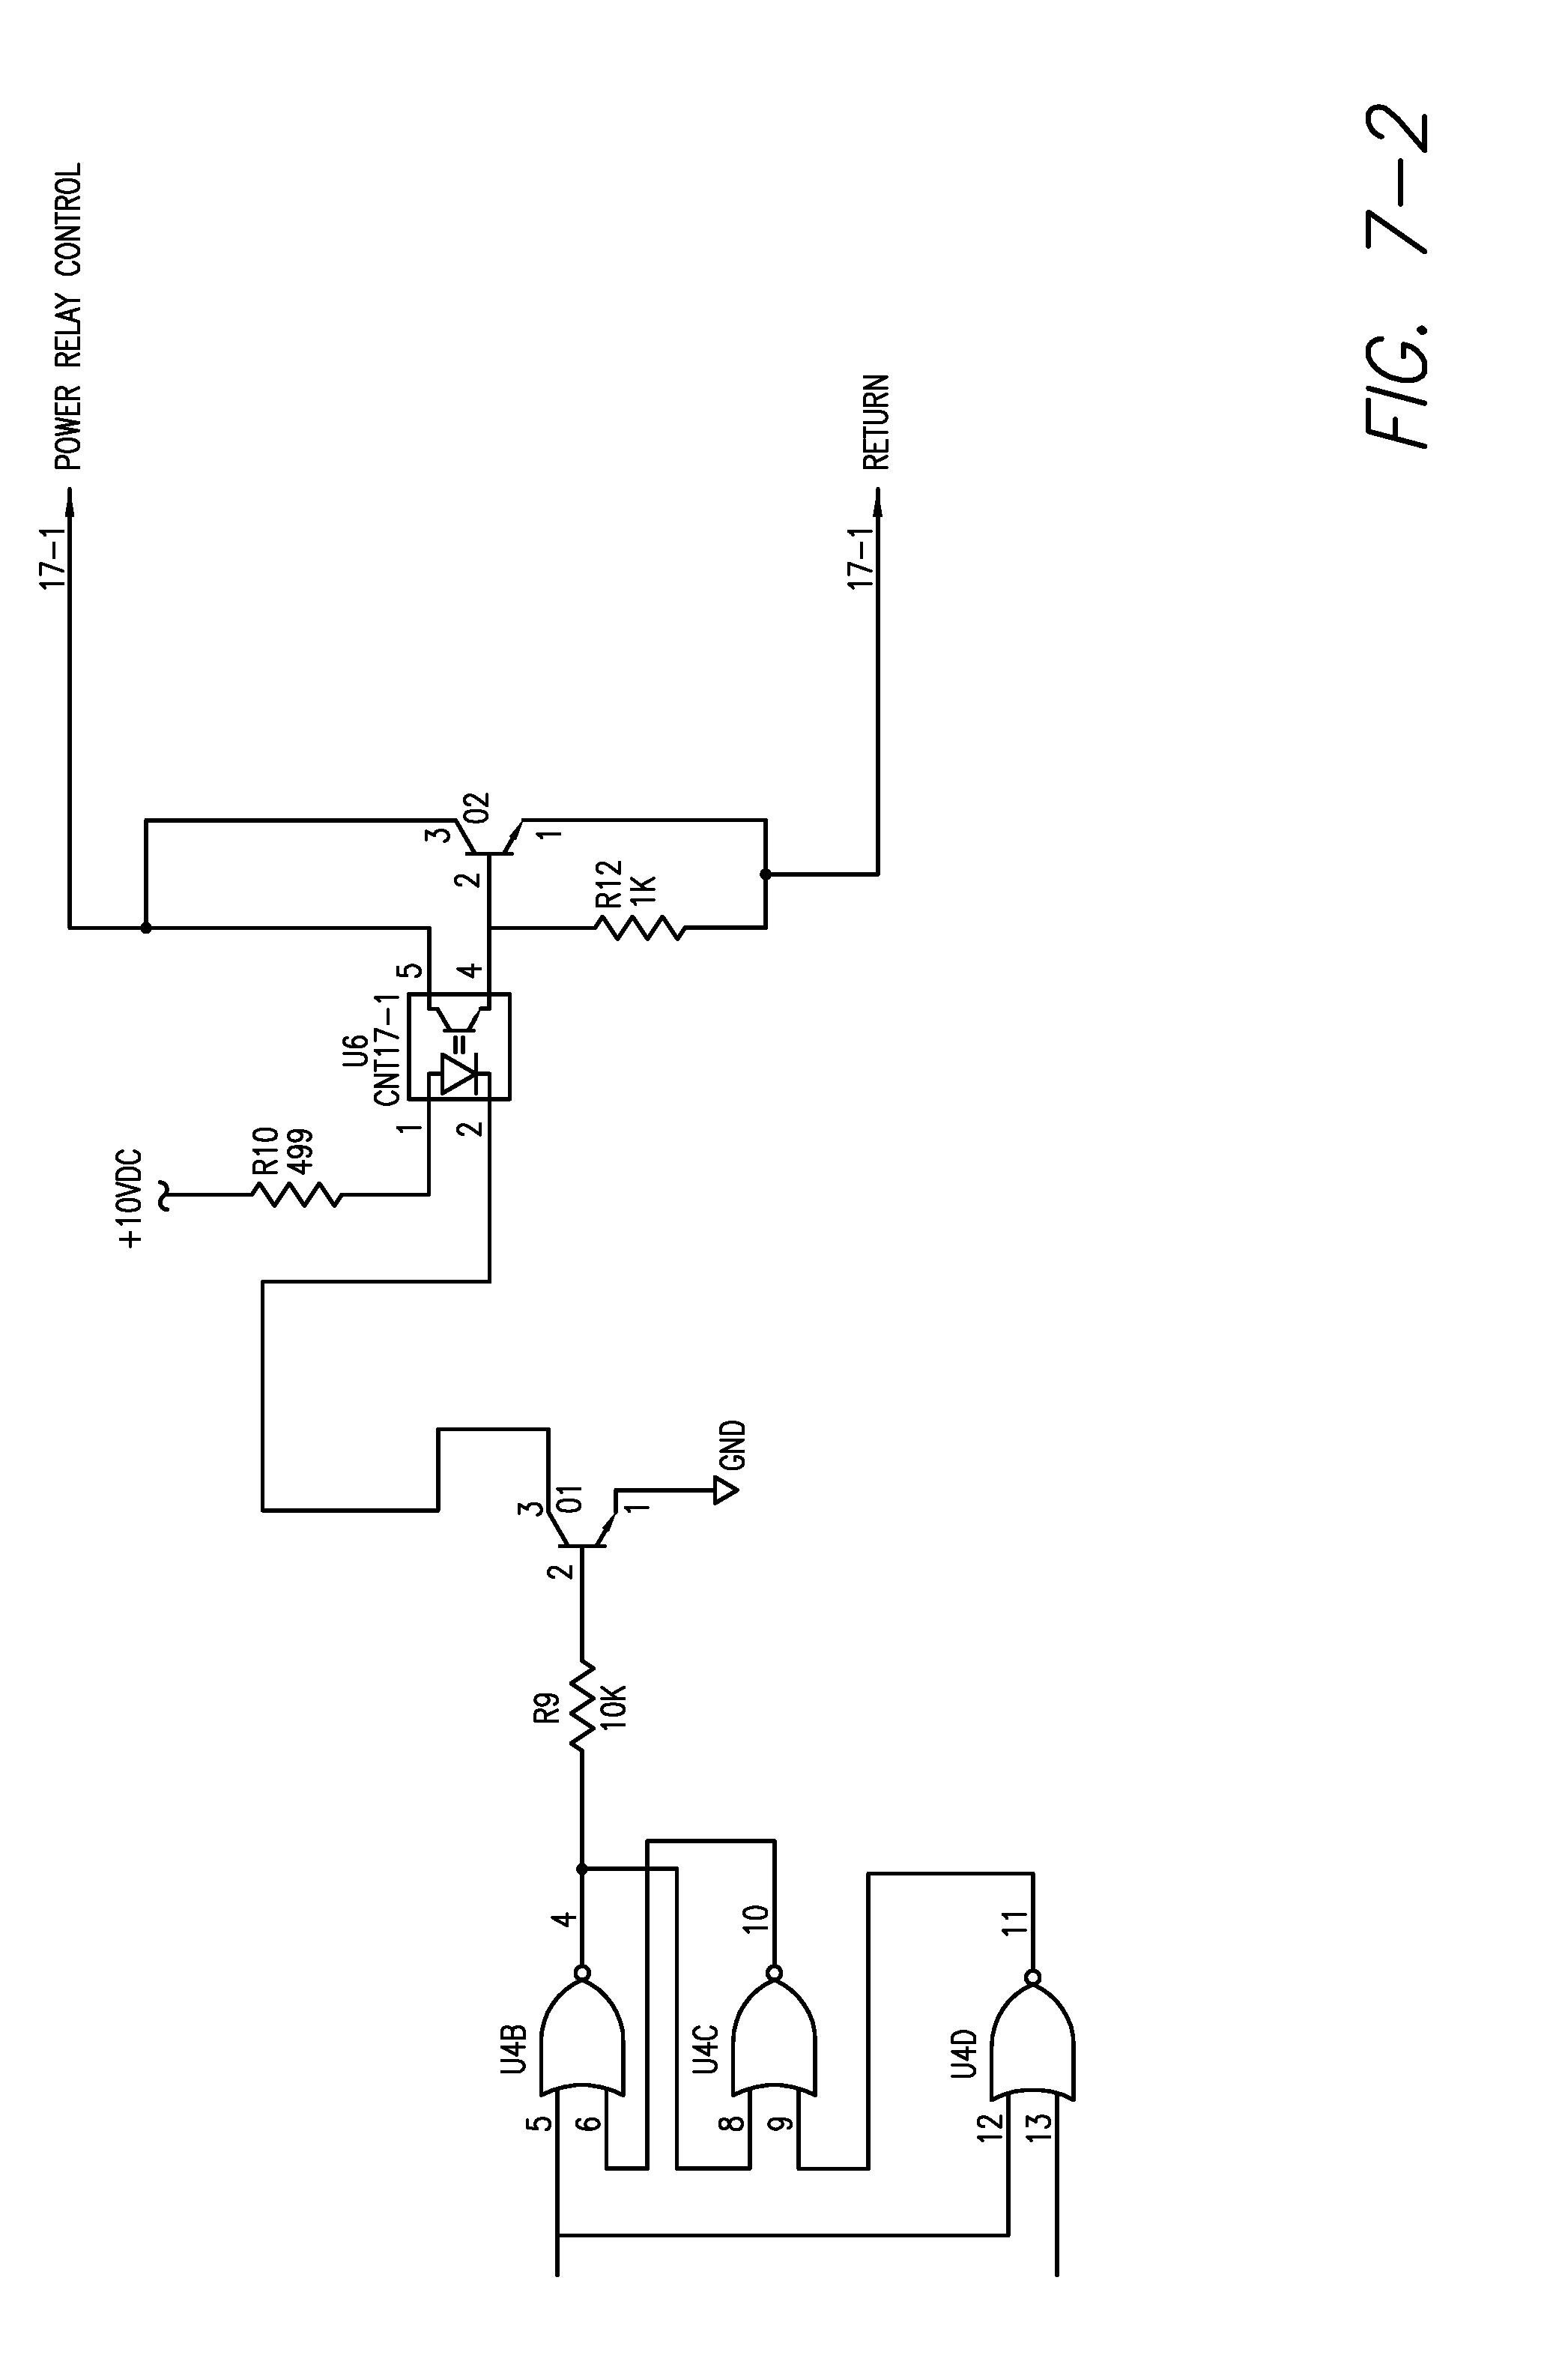 relay logic drawing free wiring diagram images